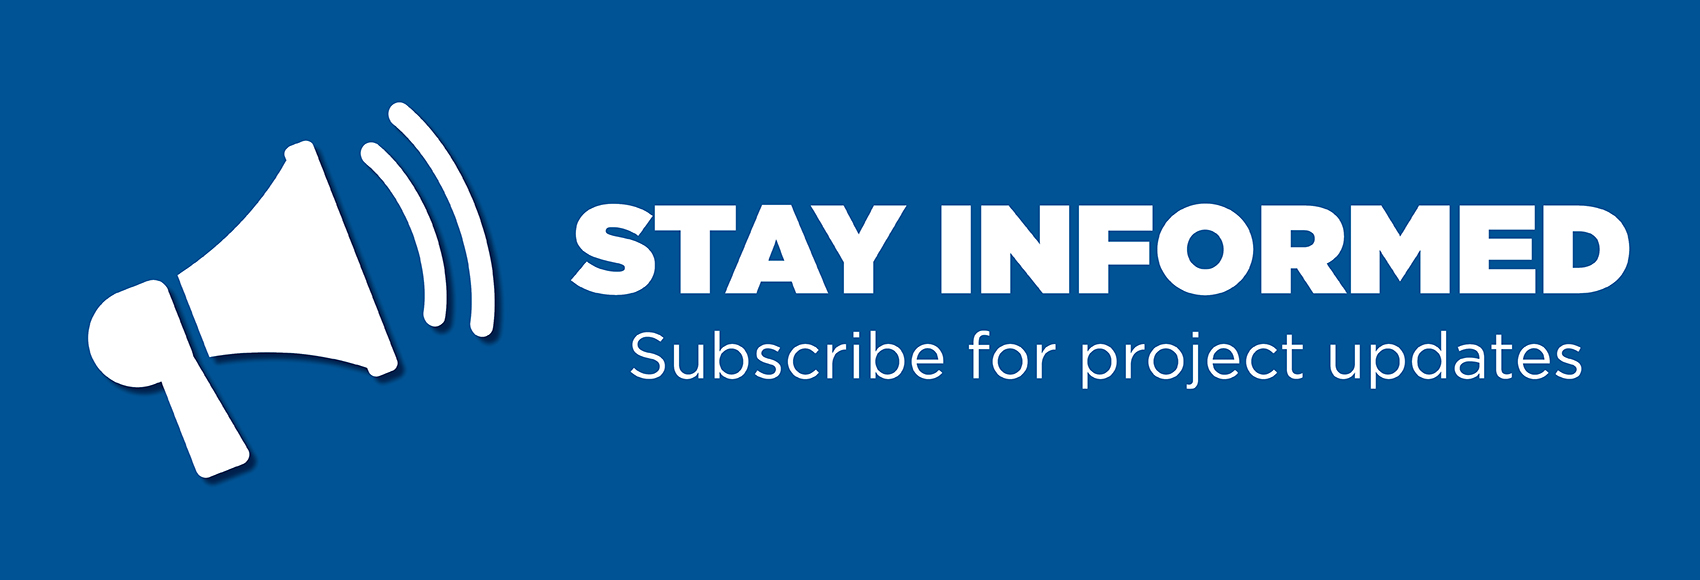 Subscription button that links to a sign up form: https://forms.office.com/Pages/ResponsePage.aspx?id=mDwEQB_wyUiyWTX8f9YmeSnZQ6NlgkxFsbT70tBRArNUMzNXVFBDNkpZVEFNMUNGWkFYMzBRMlNUVi4u